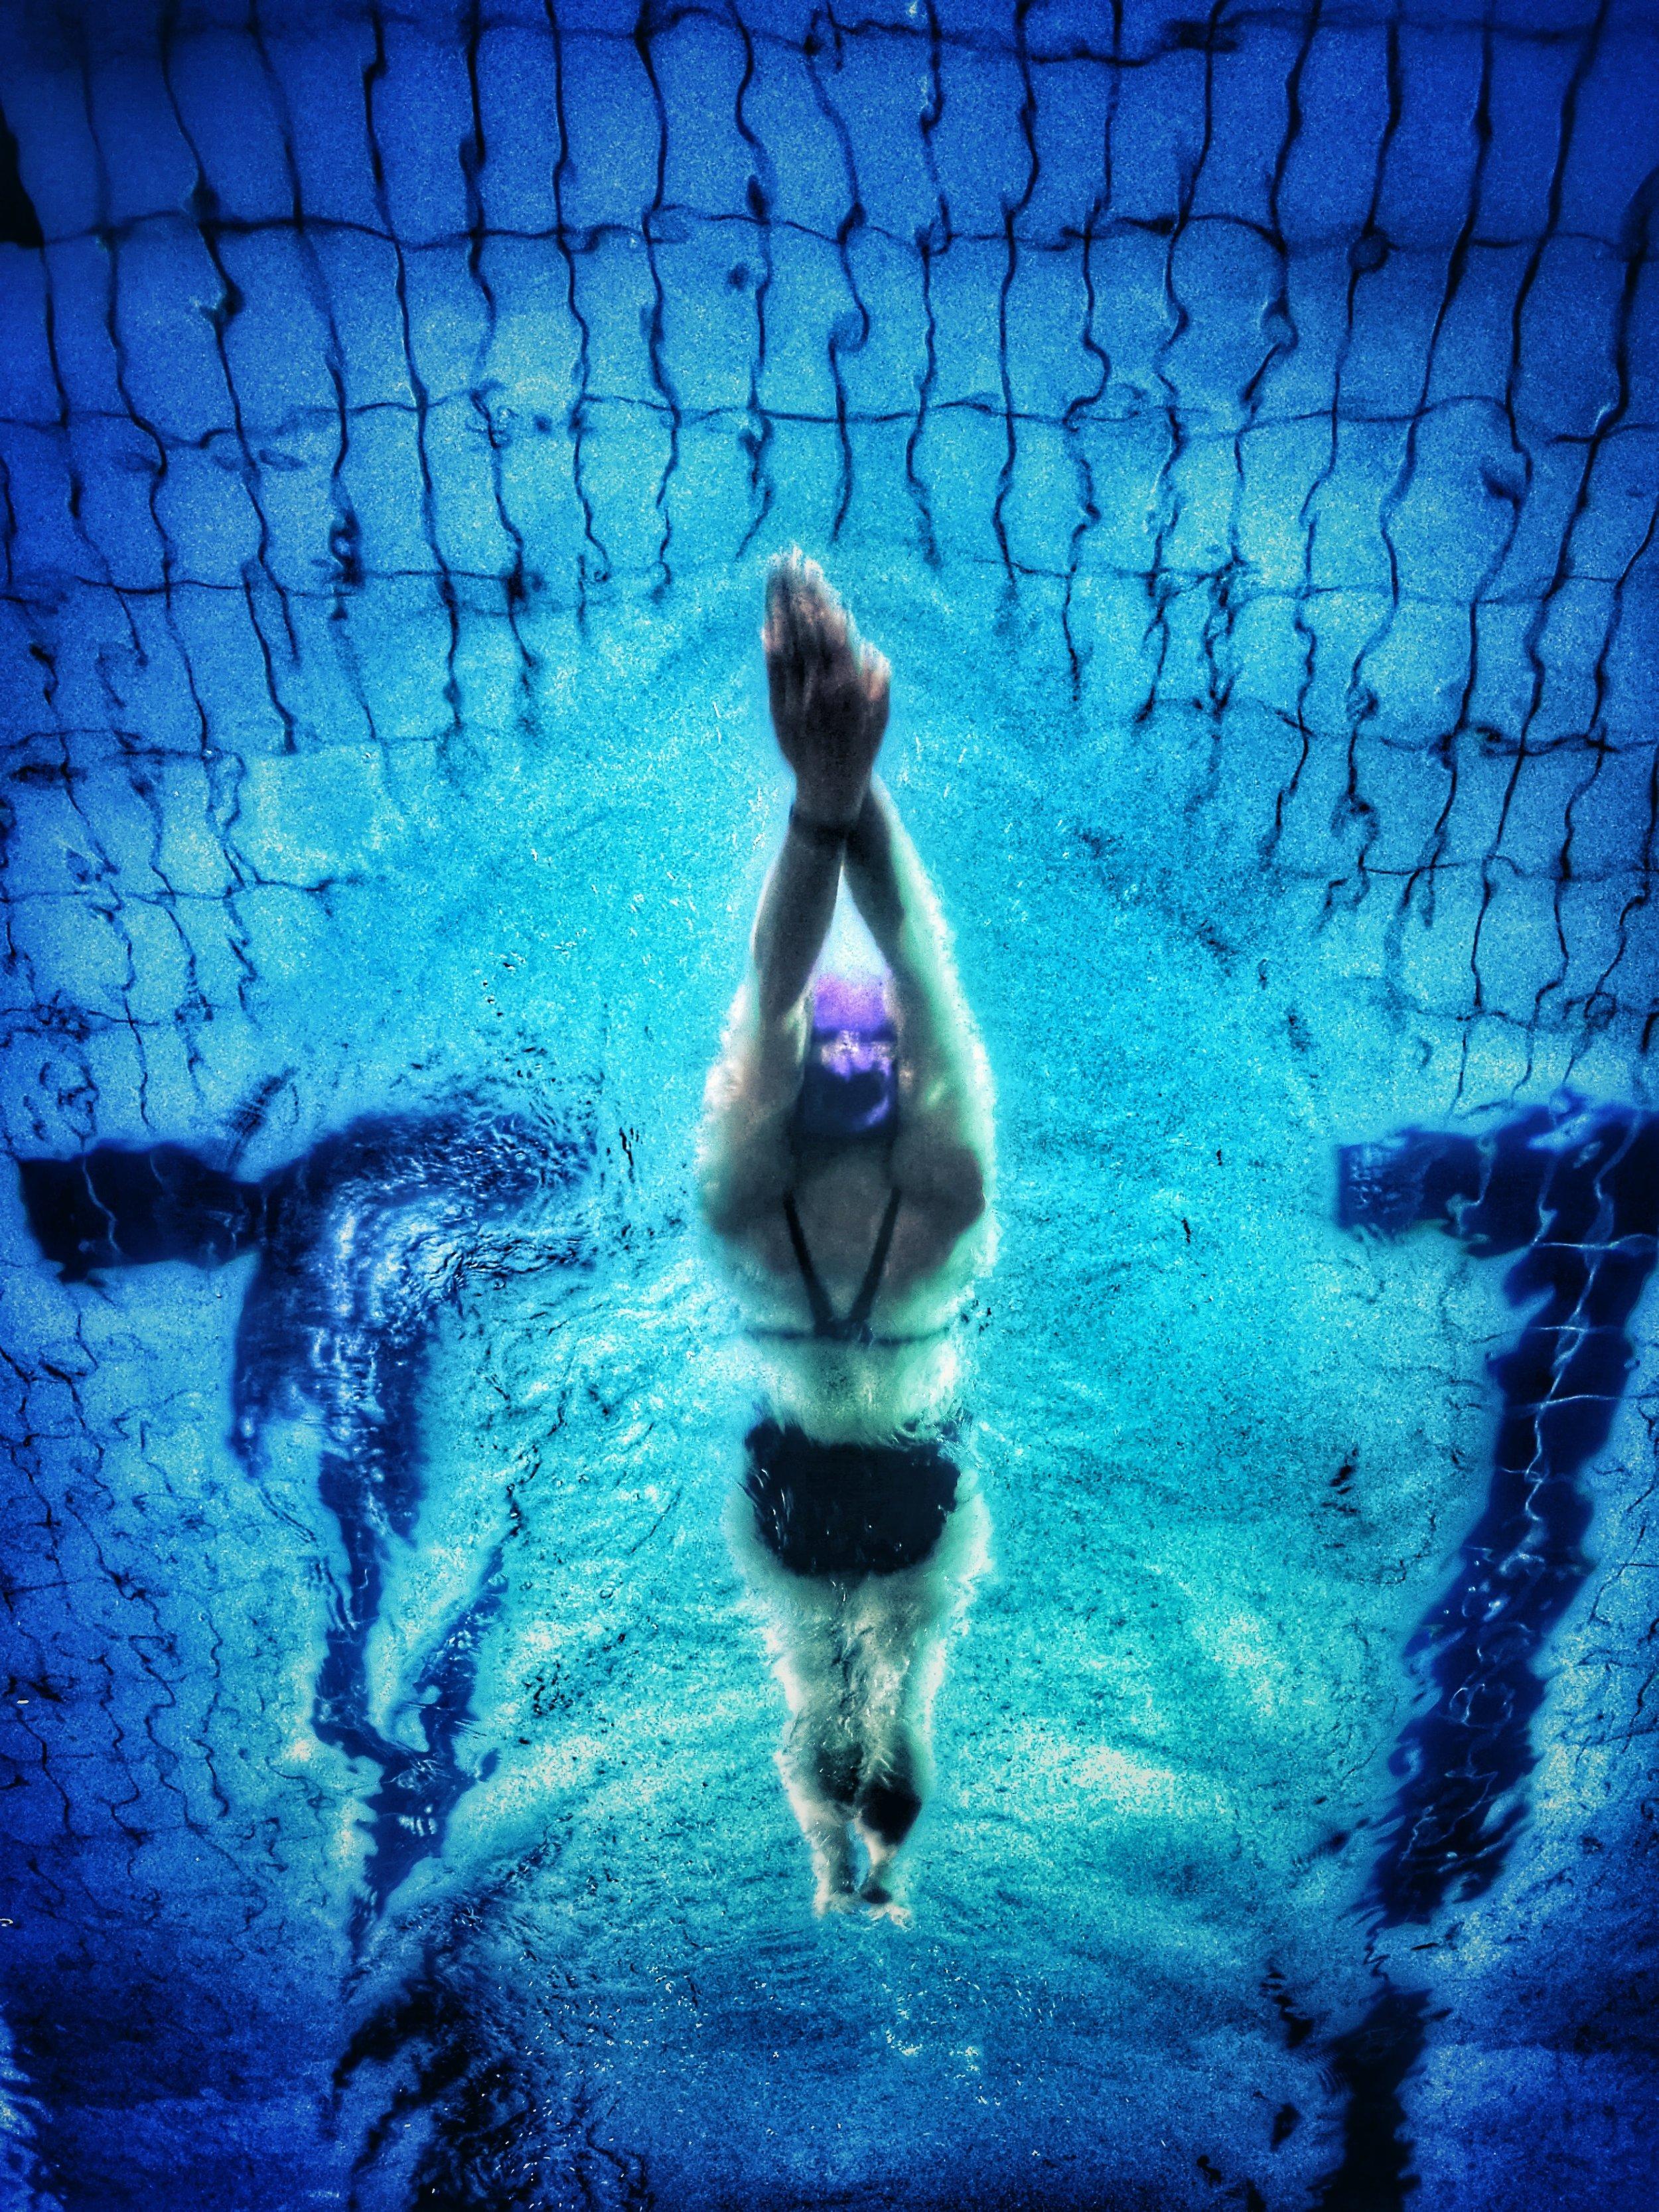 Triathlete swimming preparing for a triathlon in the pool